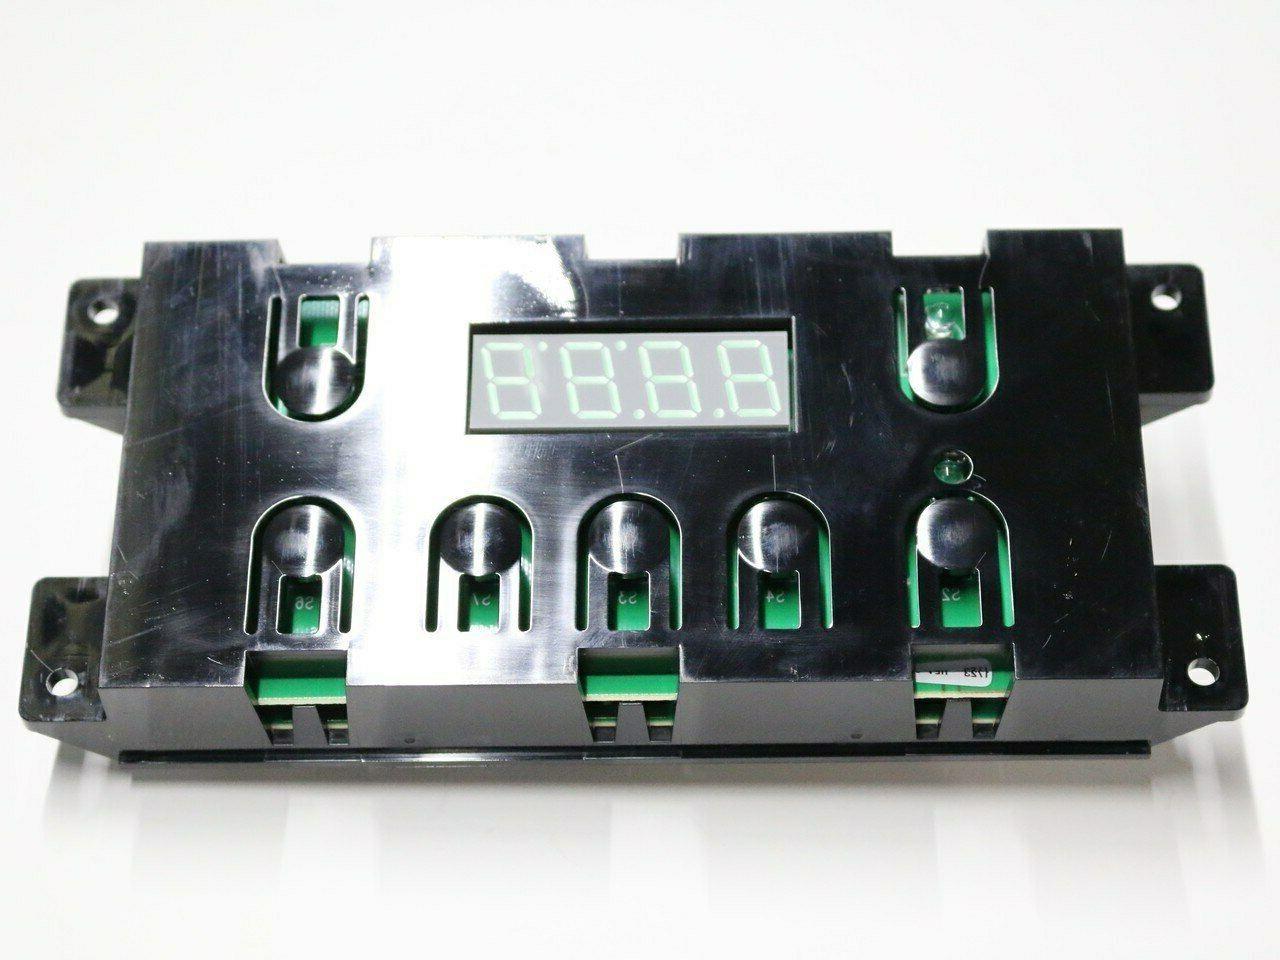 NEW ORIGINAL Frigidaire Range Electronic Control Board - 316